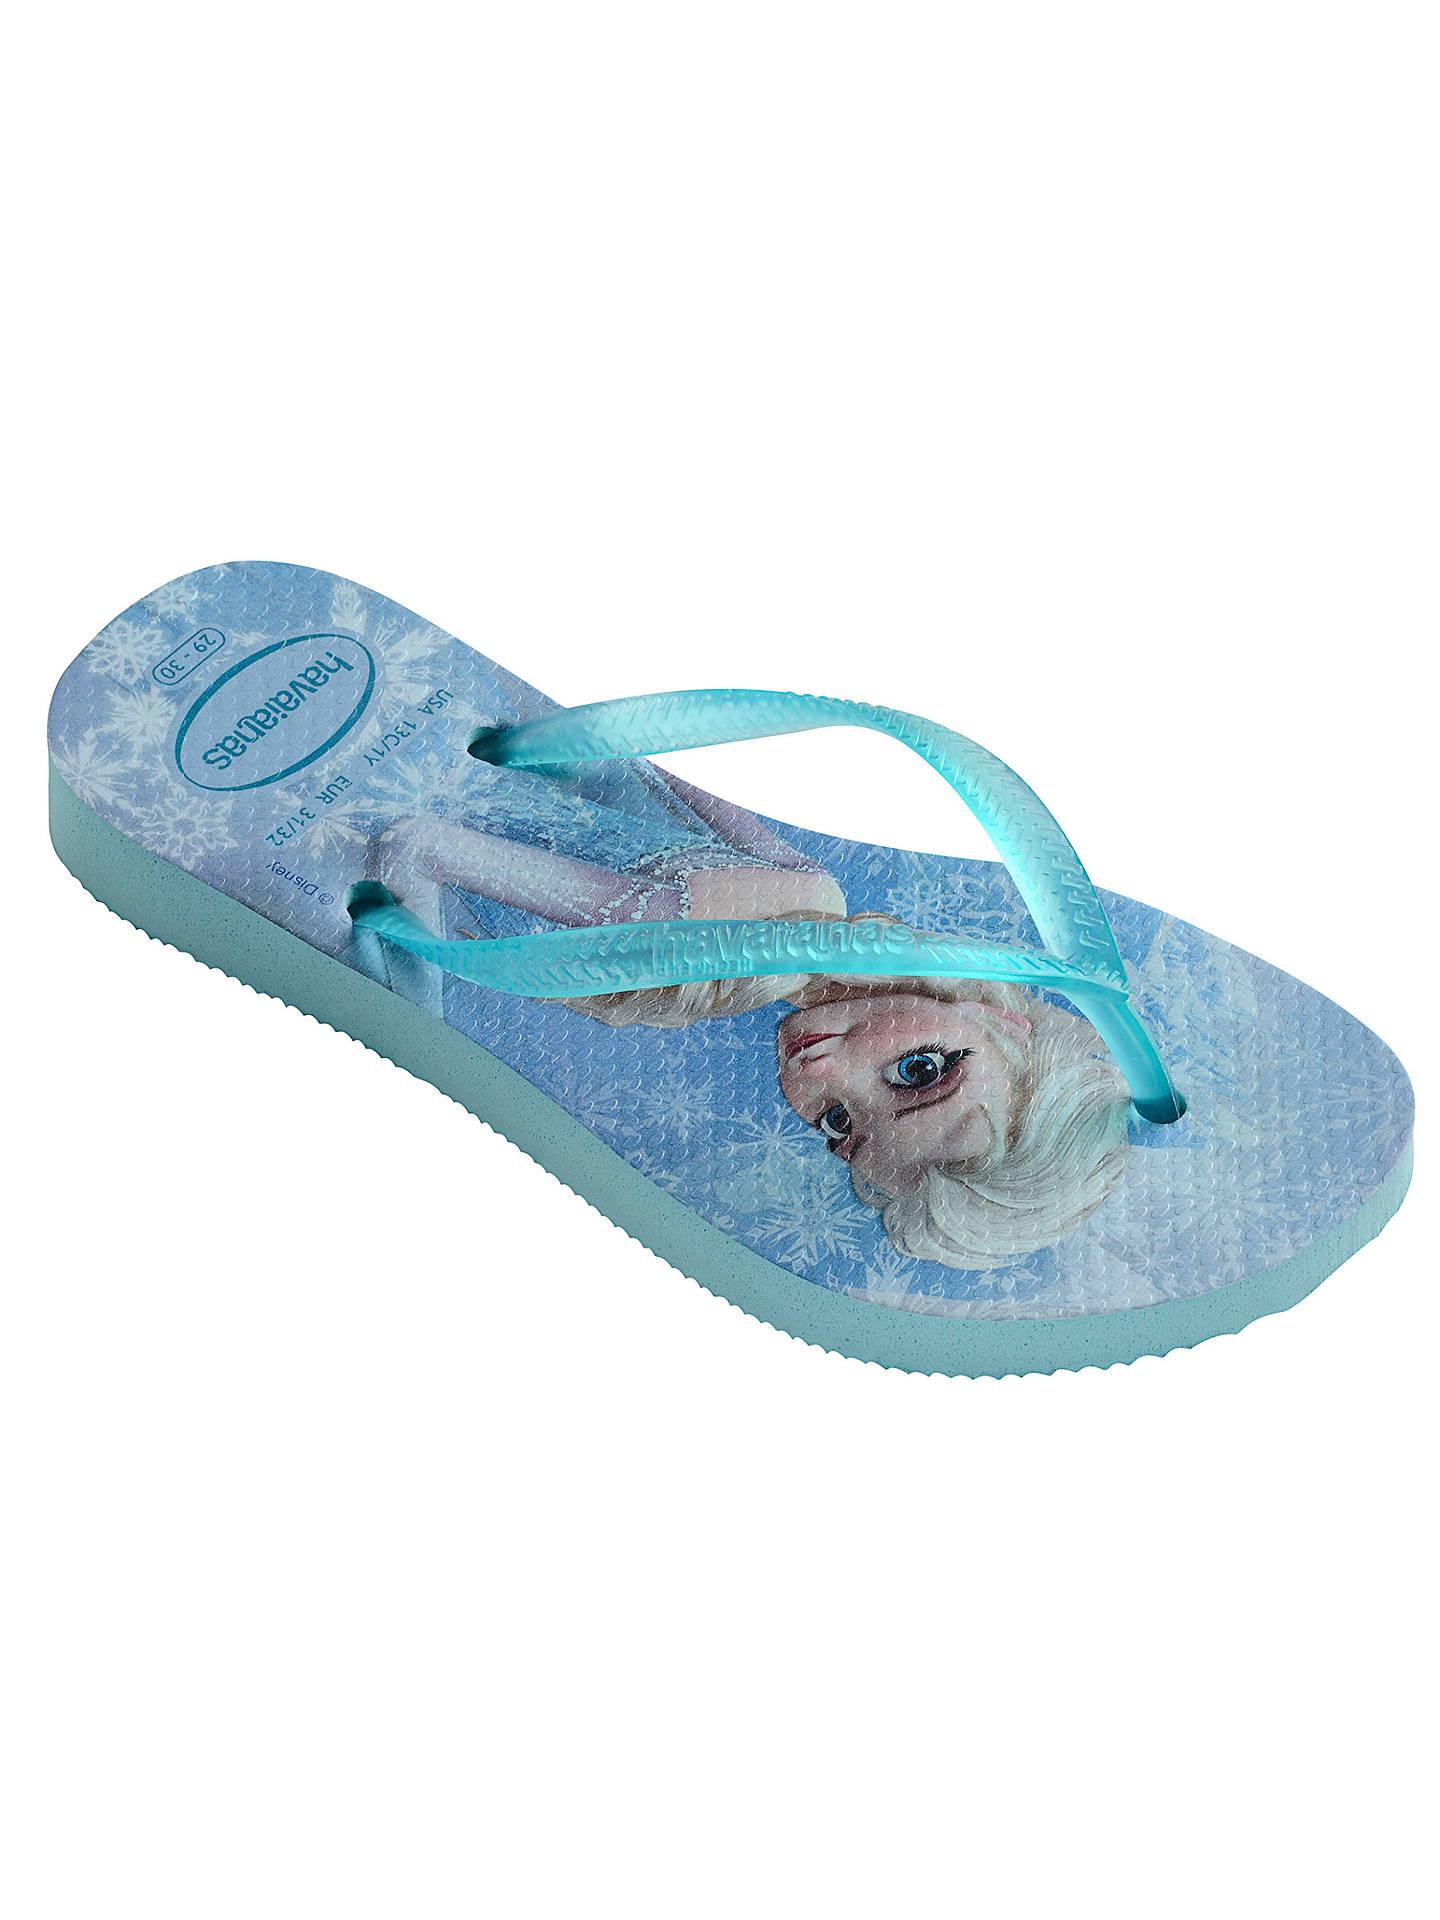 163e0809295a Buy Havaianas Slim Frozen Elsa   Olaf Flip Flops